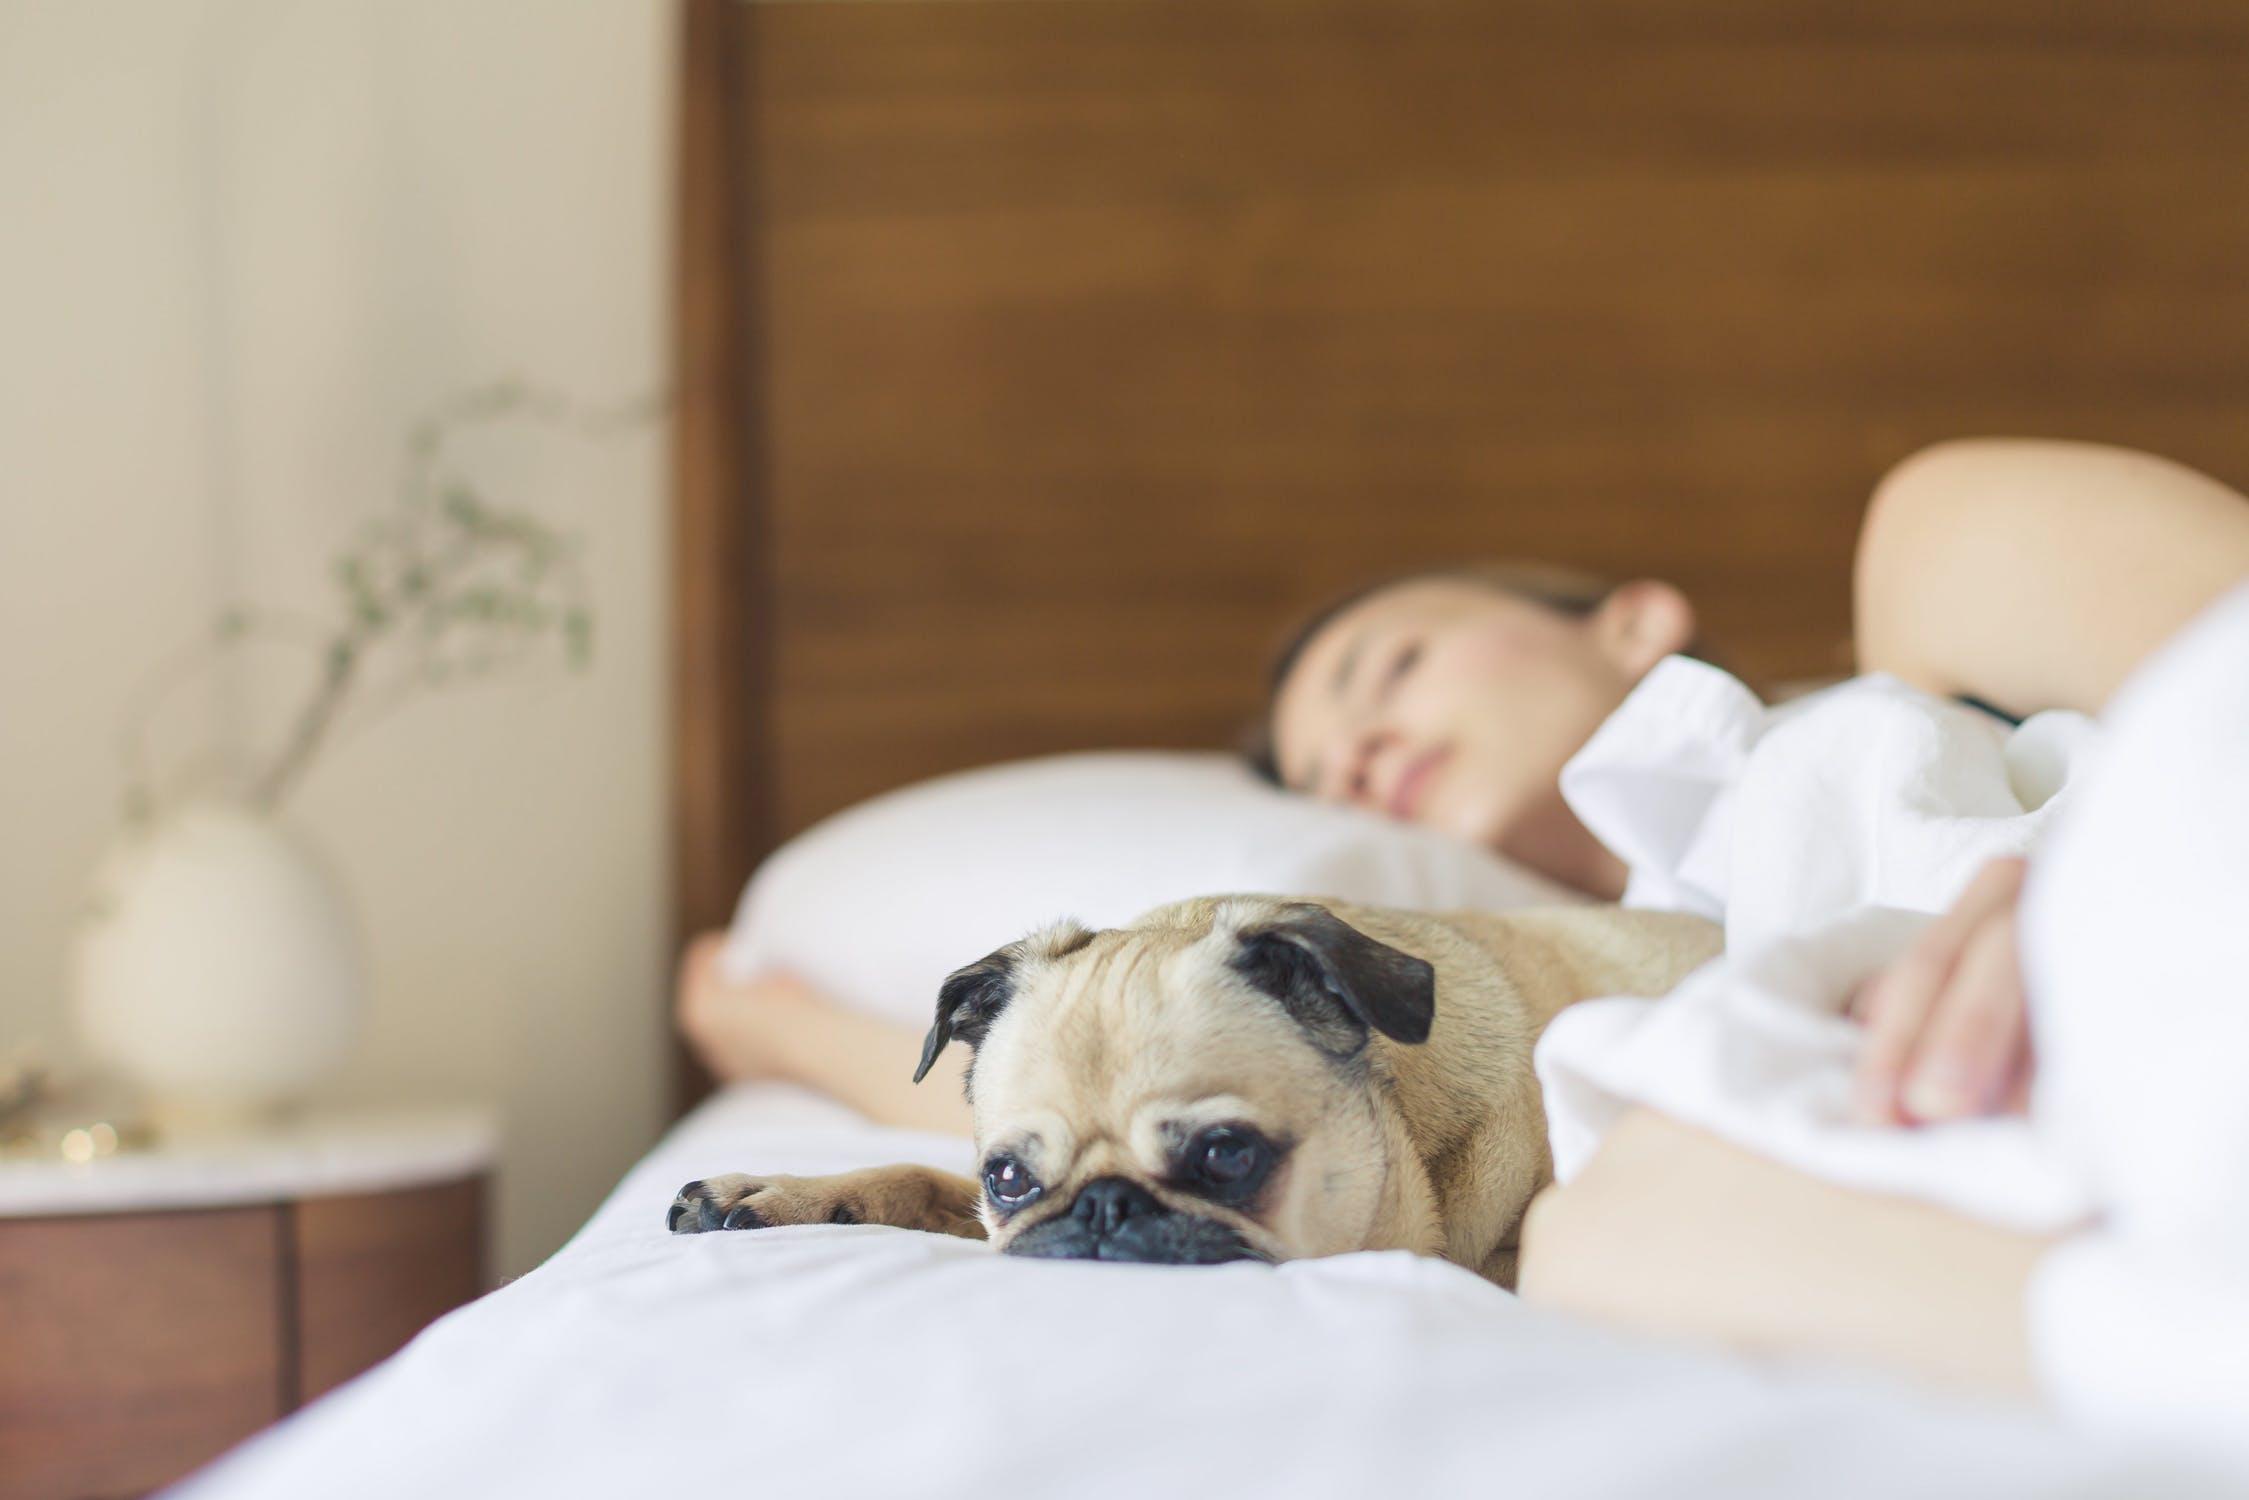 Cum poti obtine un somn bun cand dormi cu altcineva